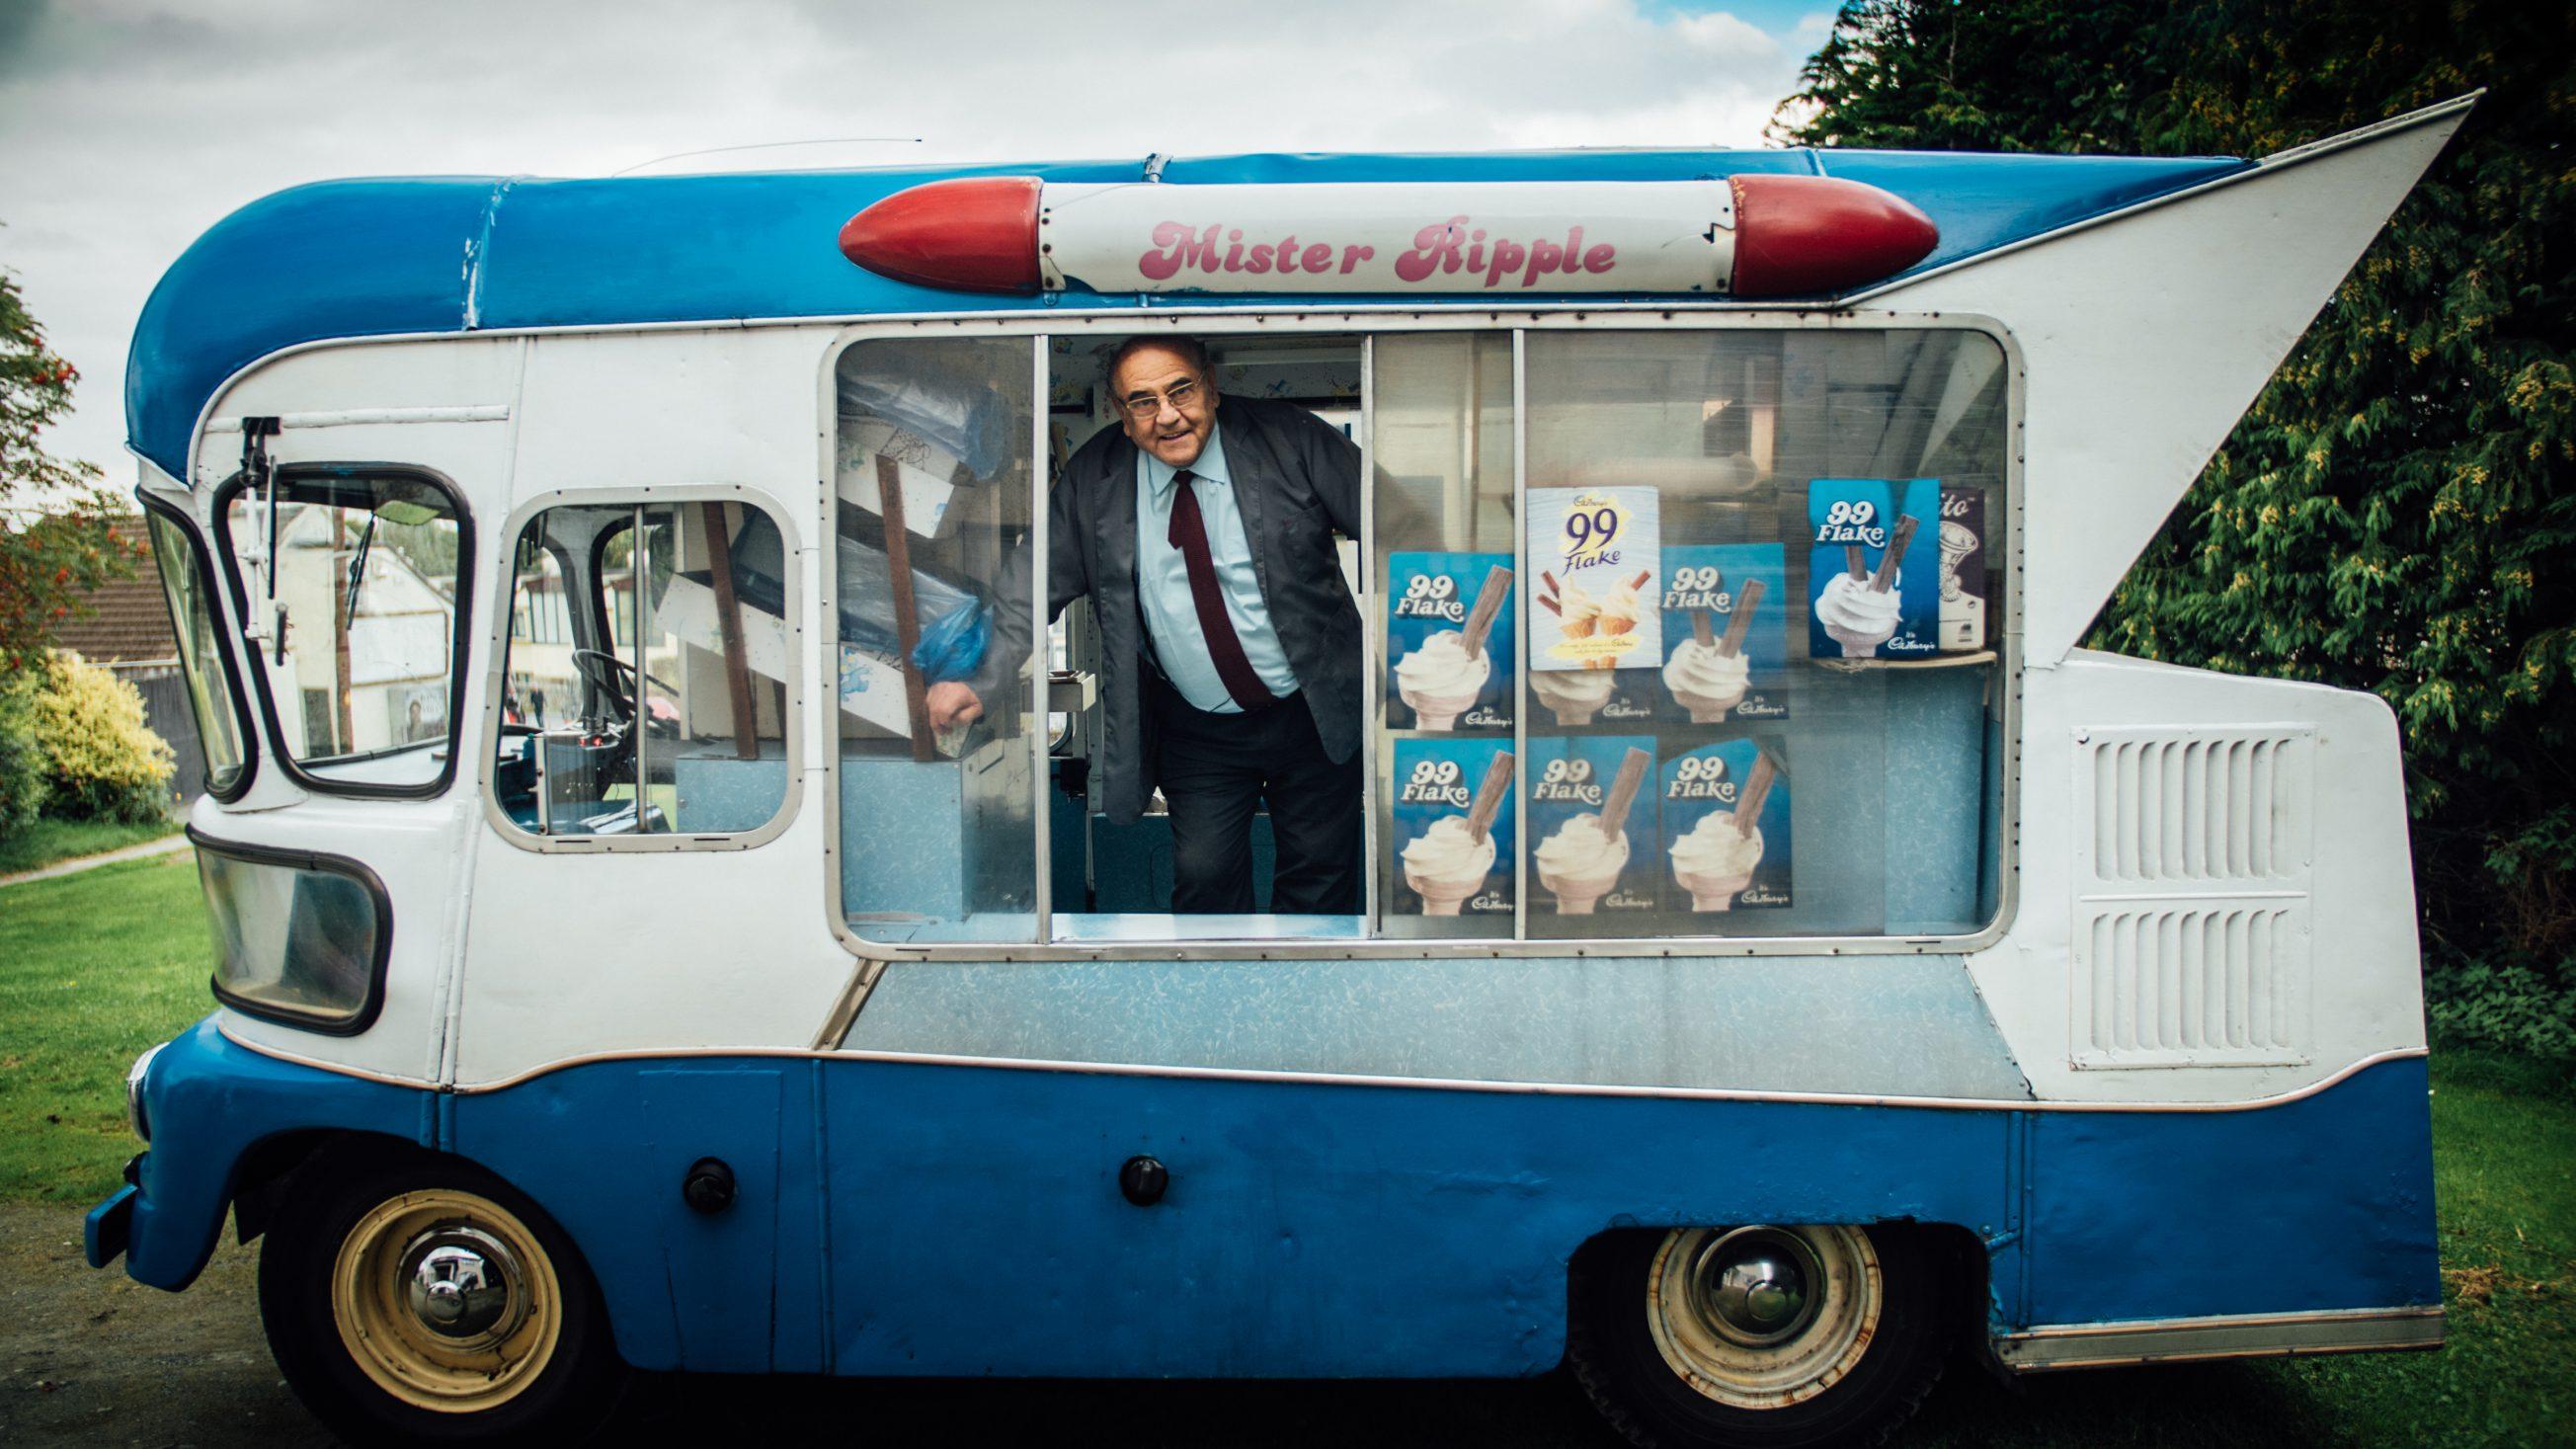 Mr. Ripple – Our documentary on Ireland's Oldest Ice Cream Man